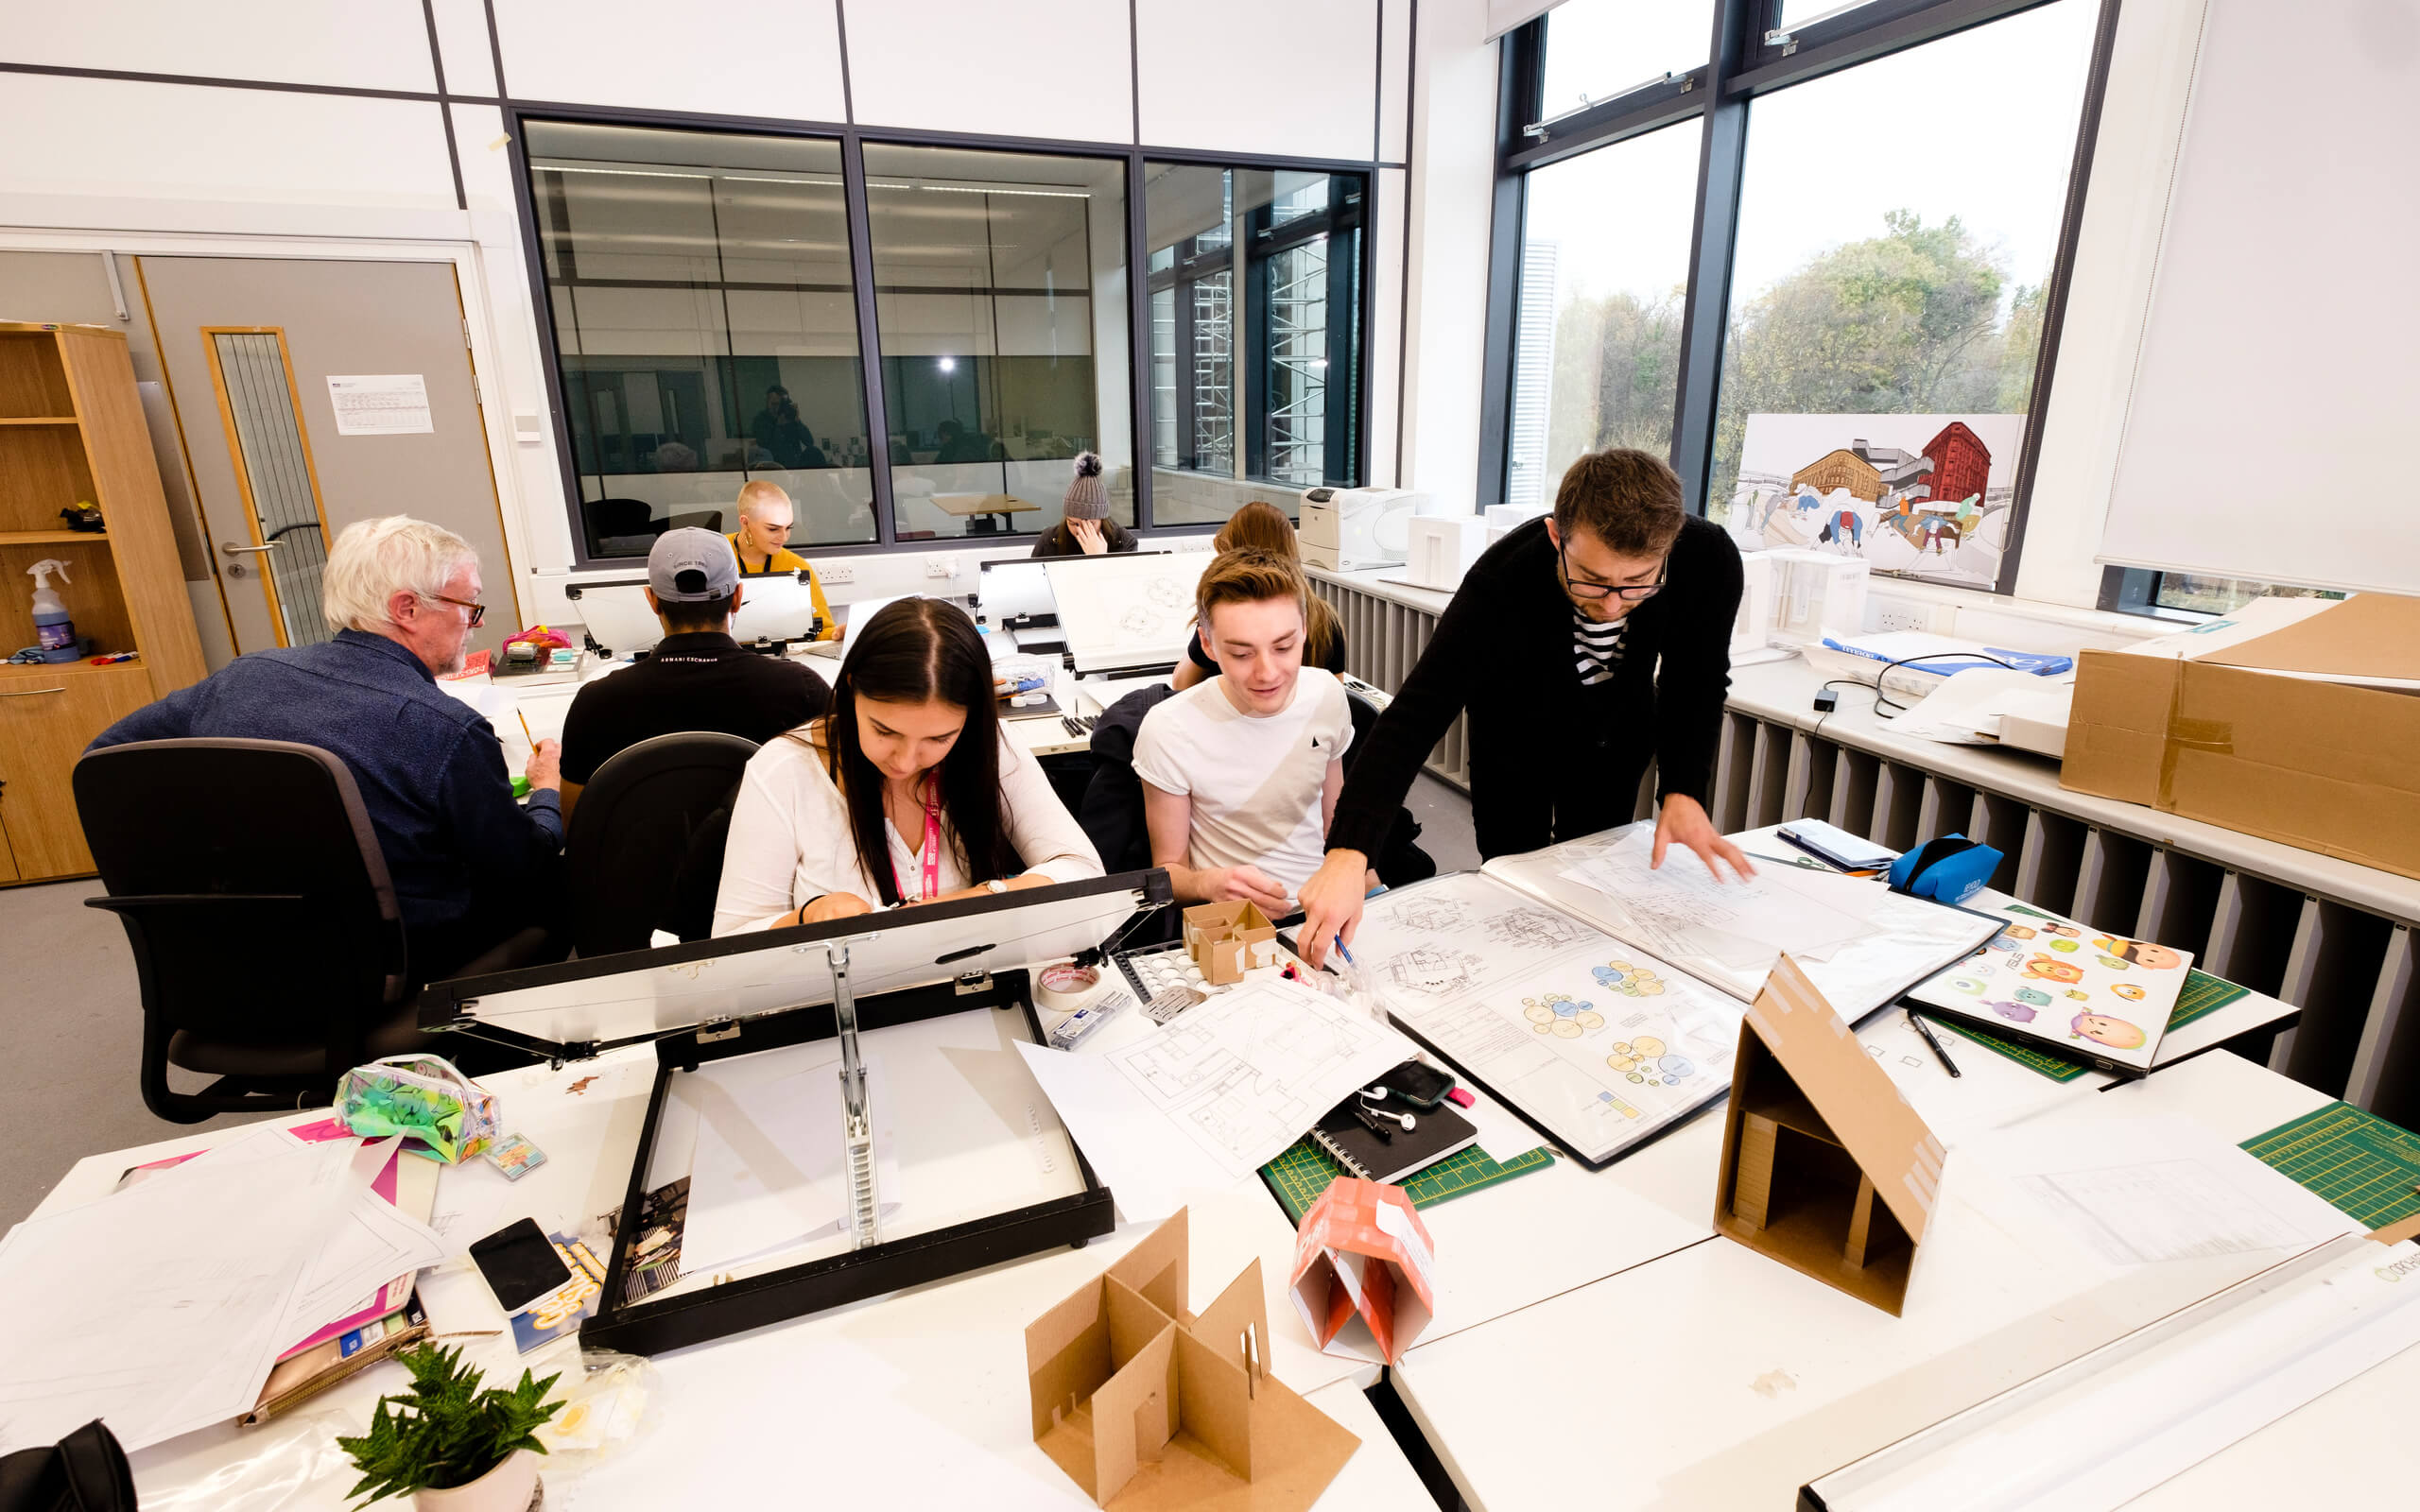 Students working in the Interior Design studio